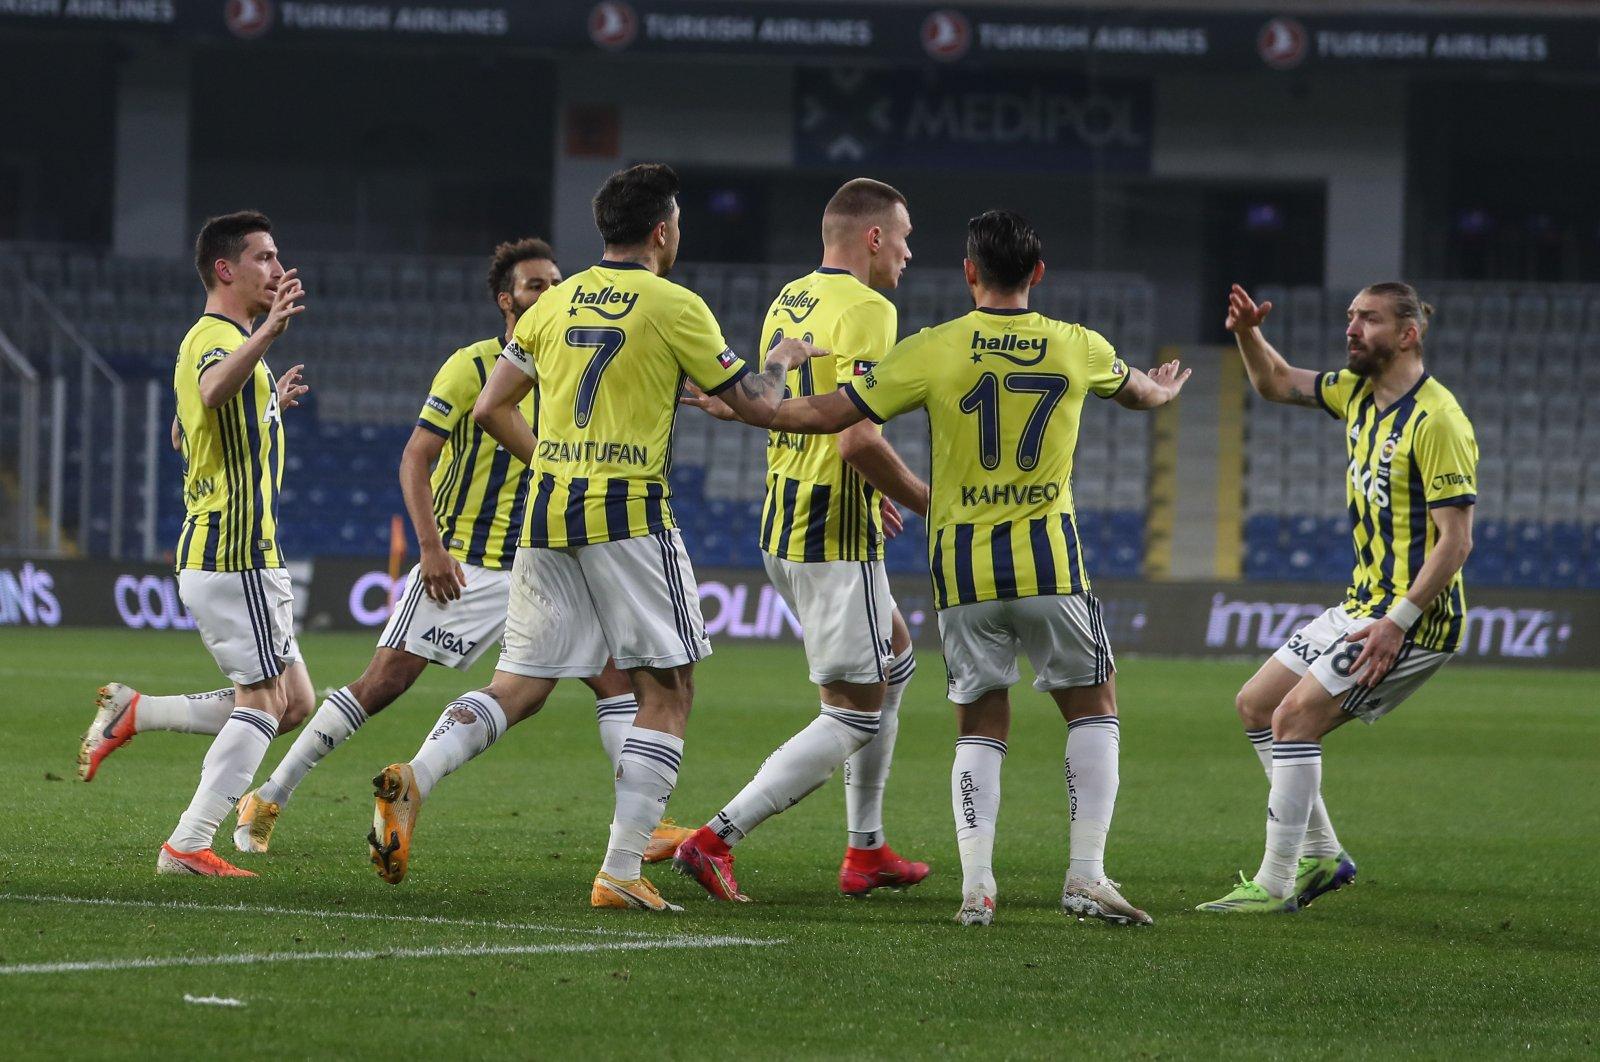 Fenerbahçe players celebrate a goal against Başakşehir in a Süper Lig match, Istanbul, Turkey, April 18, 2021.